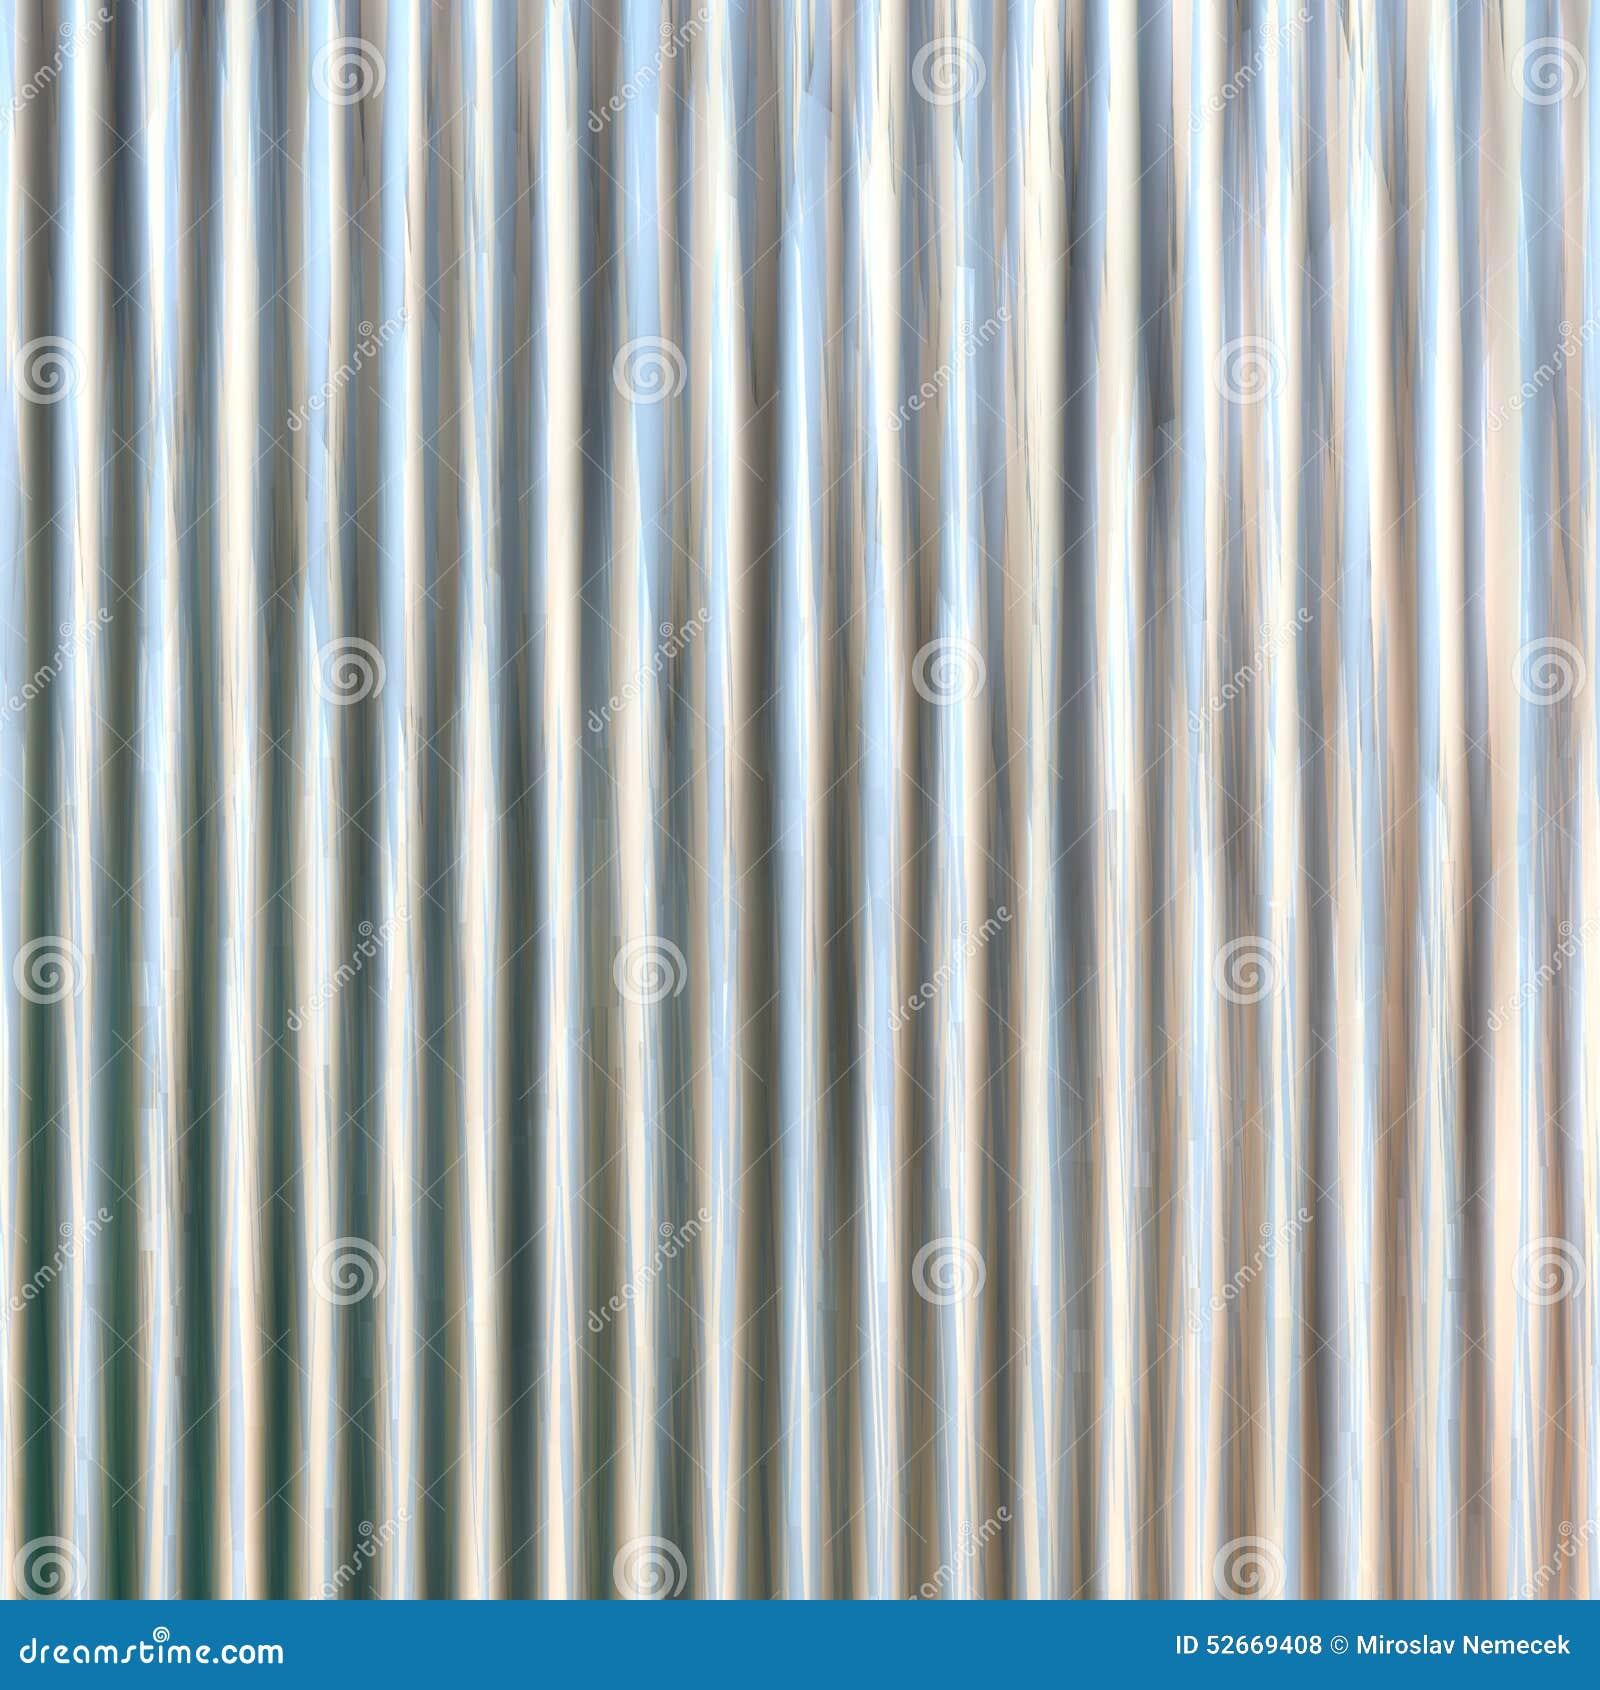 Corrugated Iron Sheet Generated Texture Stock Illustration